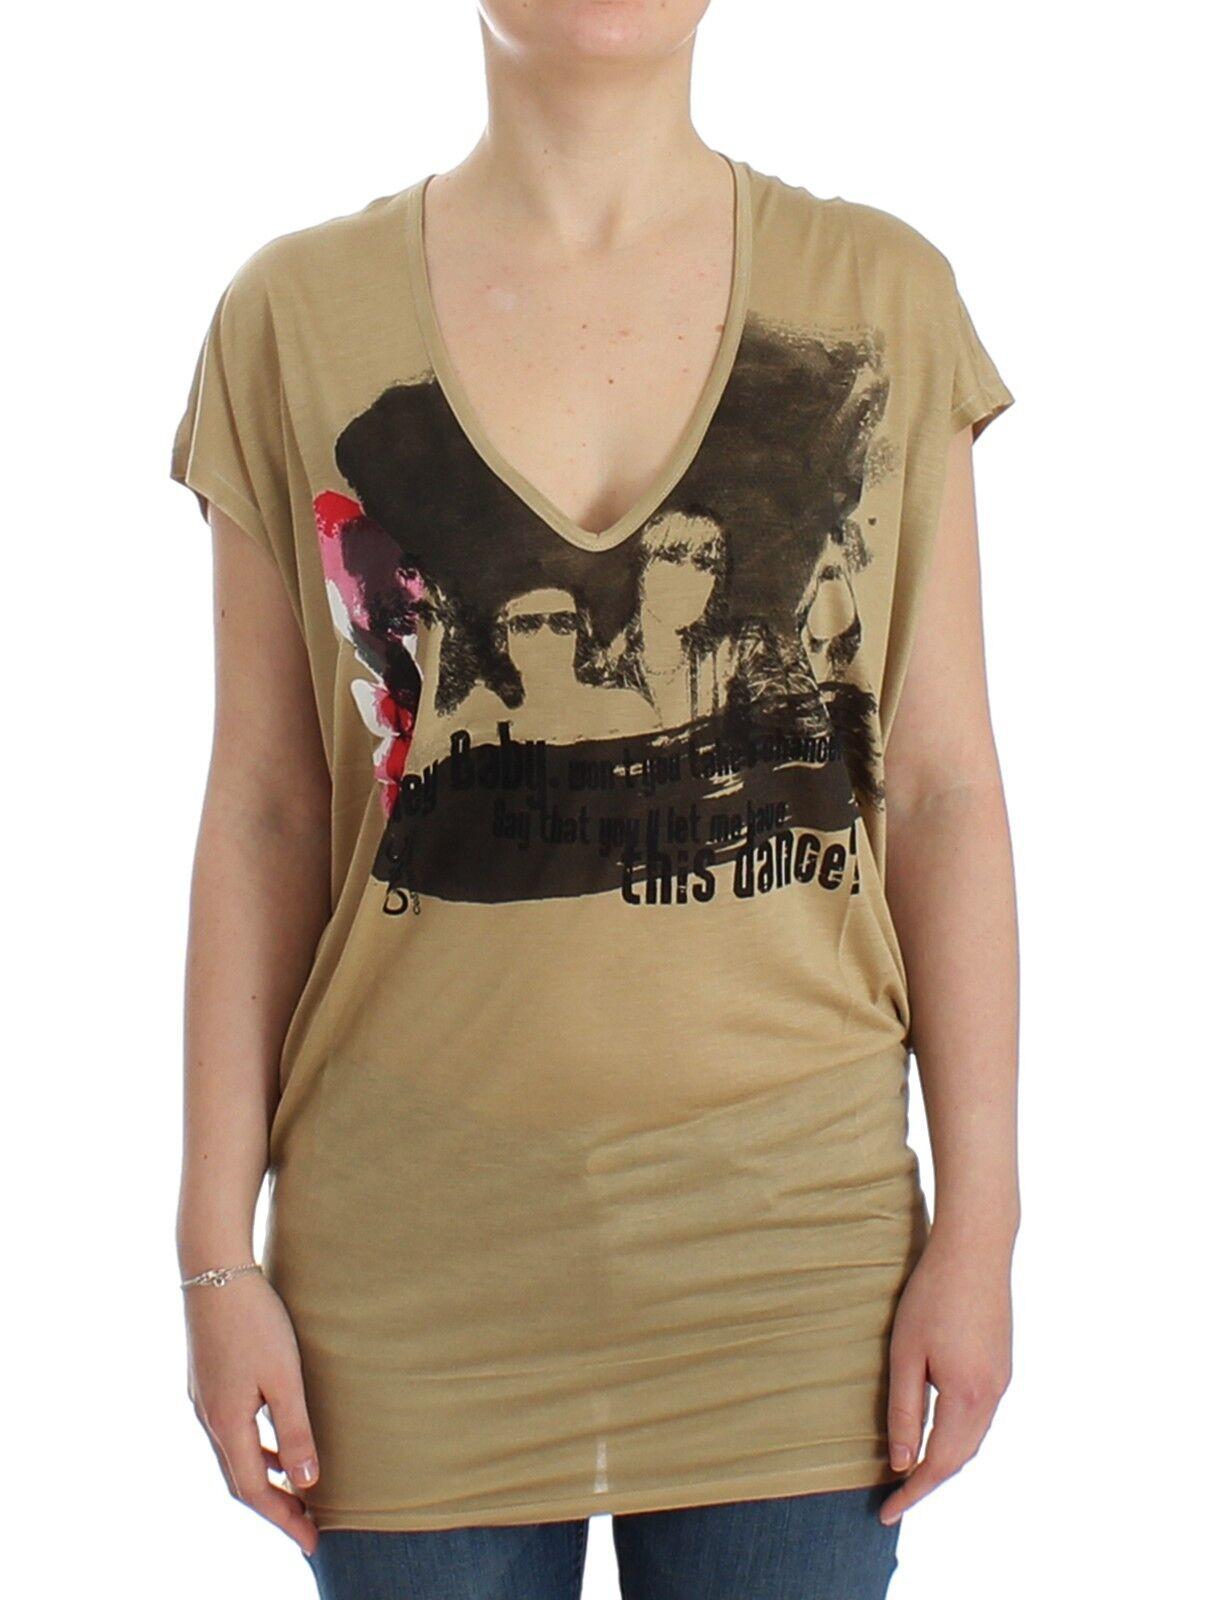 NWT C'N'c COSTUME NATIONAL Beige Motive Print T-shirt Top Tunic s. s